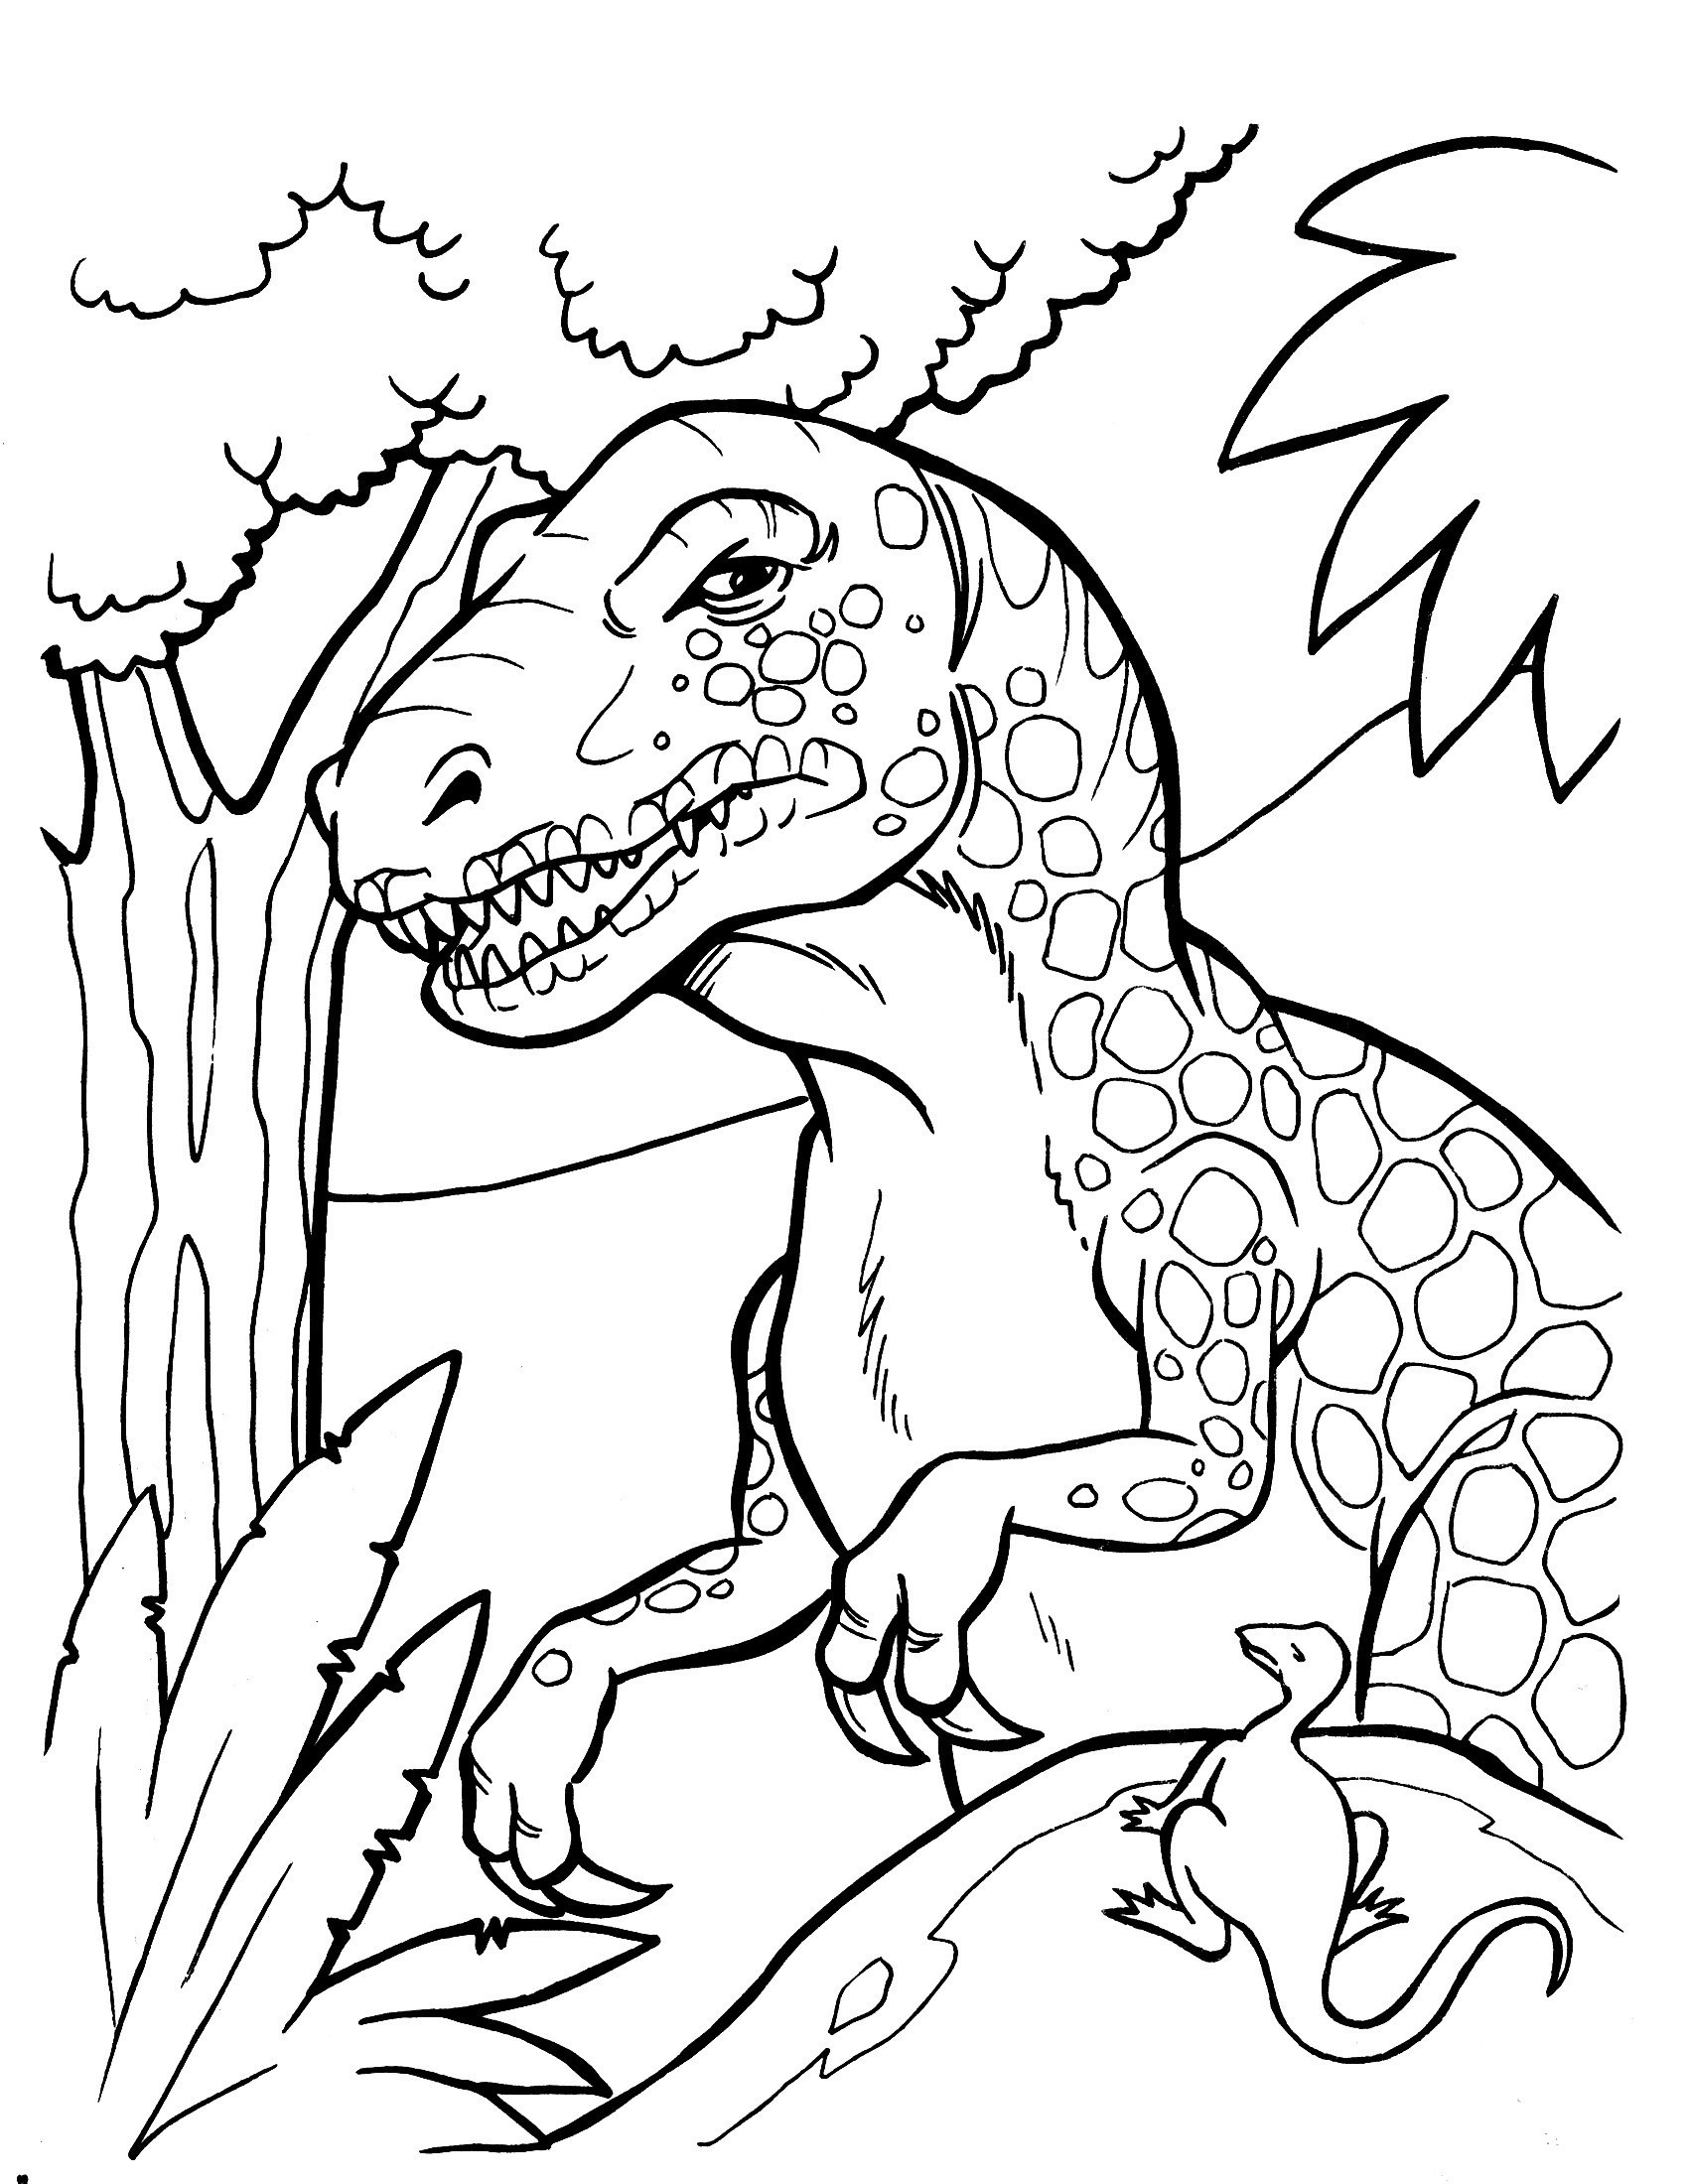 Dinosaurier Ausmalbilder Tyrannosaurus Rex Neu Dinos Ausmalbilder Elegant 35 Ausmalbilder Einfach Scoredatscore Bild